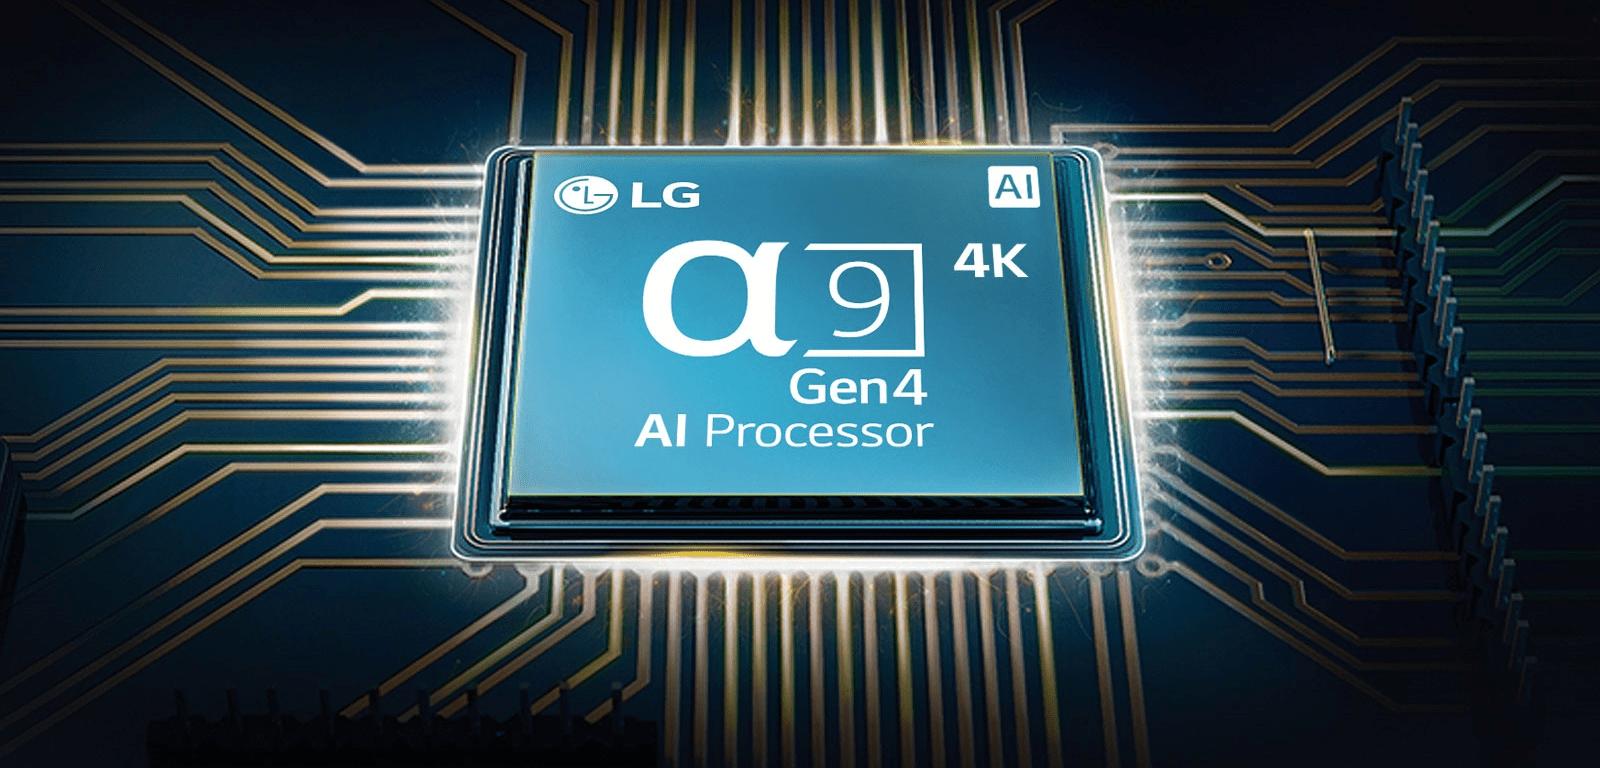 LG TV televize OLED evo 4K 2021 procesor α9 4K Gen4 AI